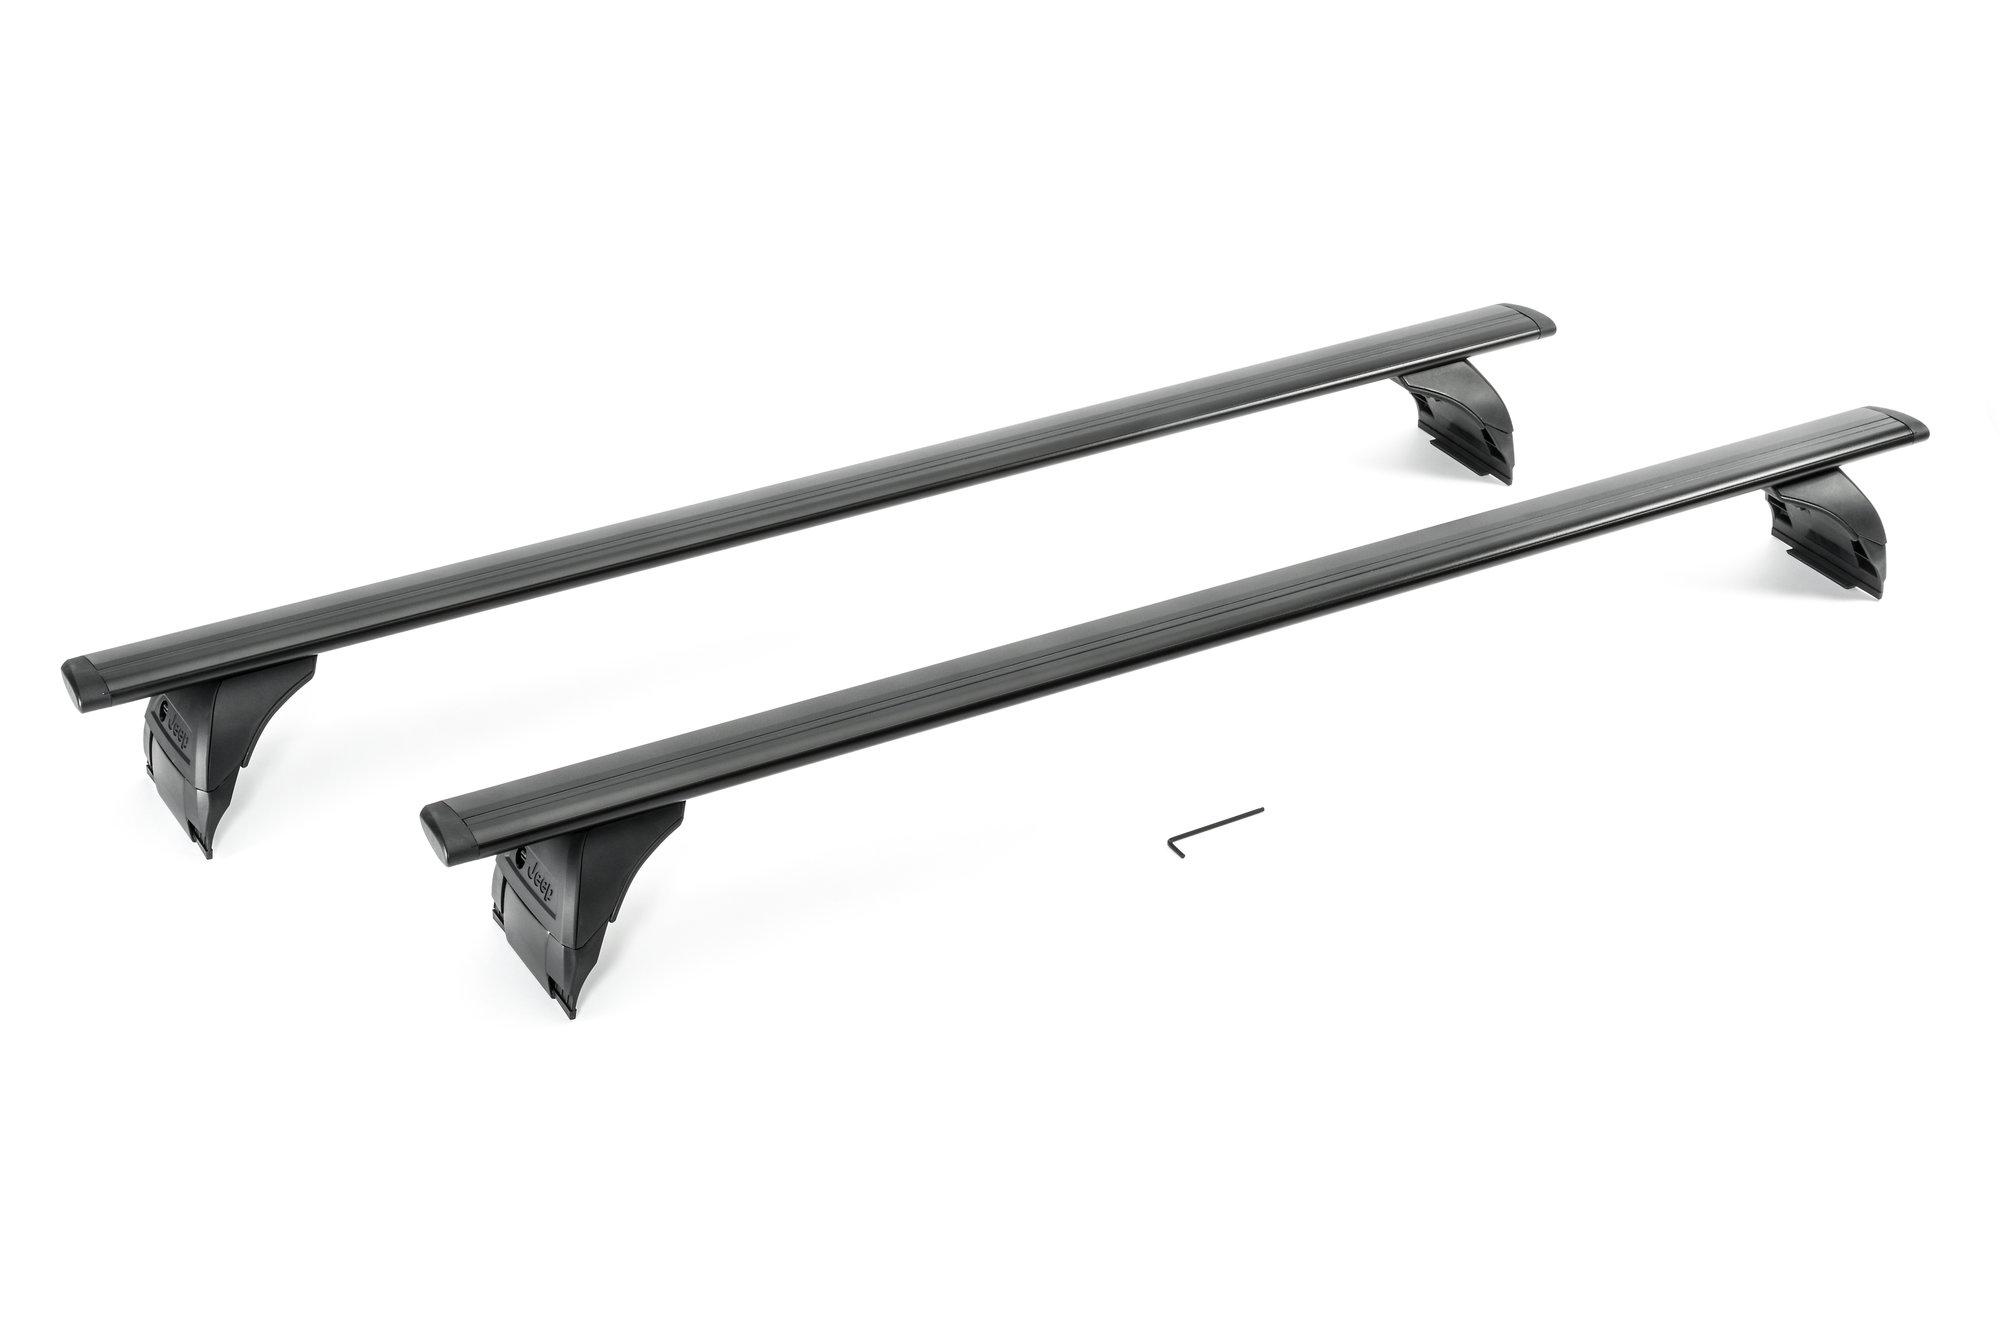 Mopar 82215387 Removable Roof Rack Kit for 18-19 Jeep